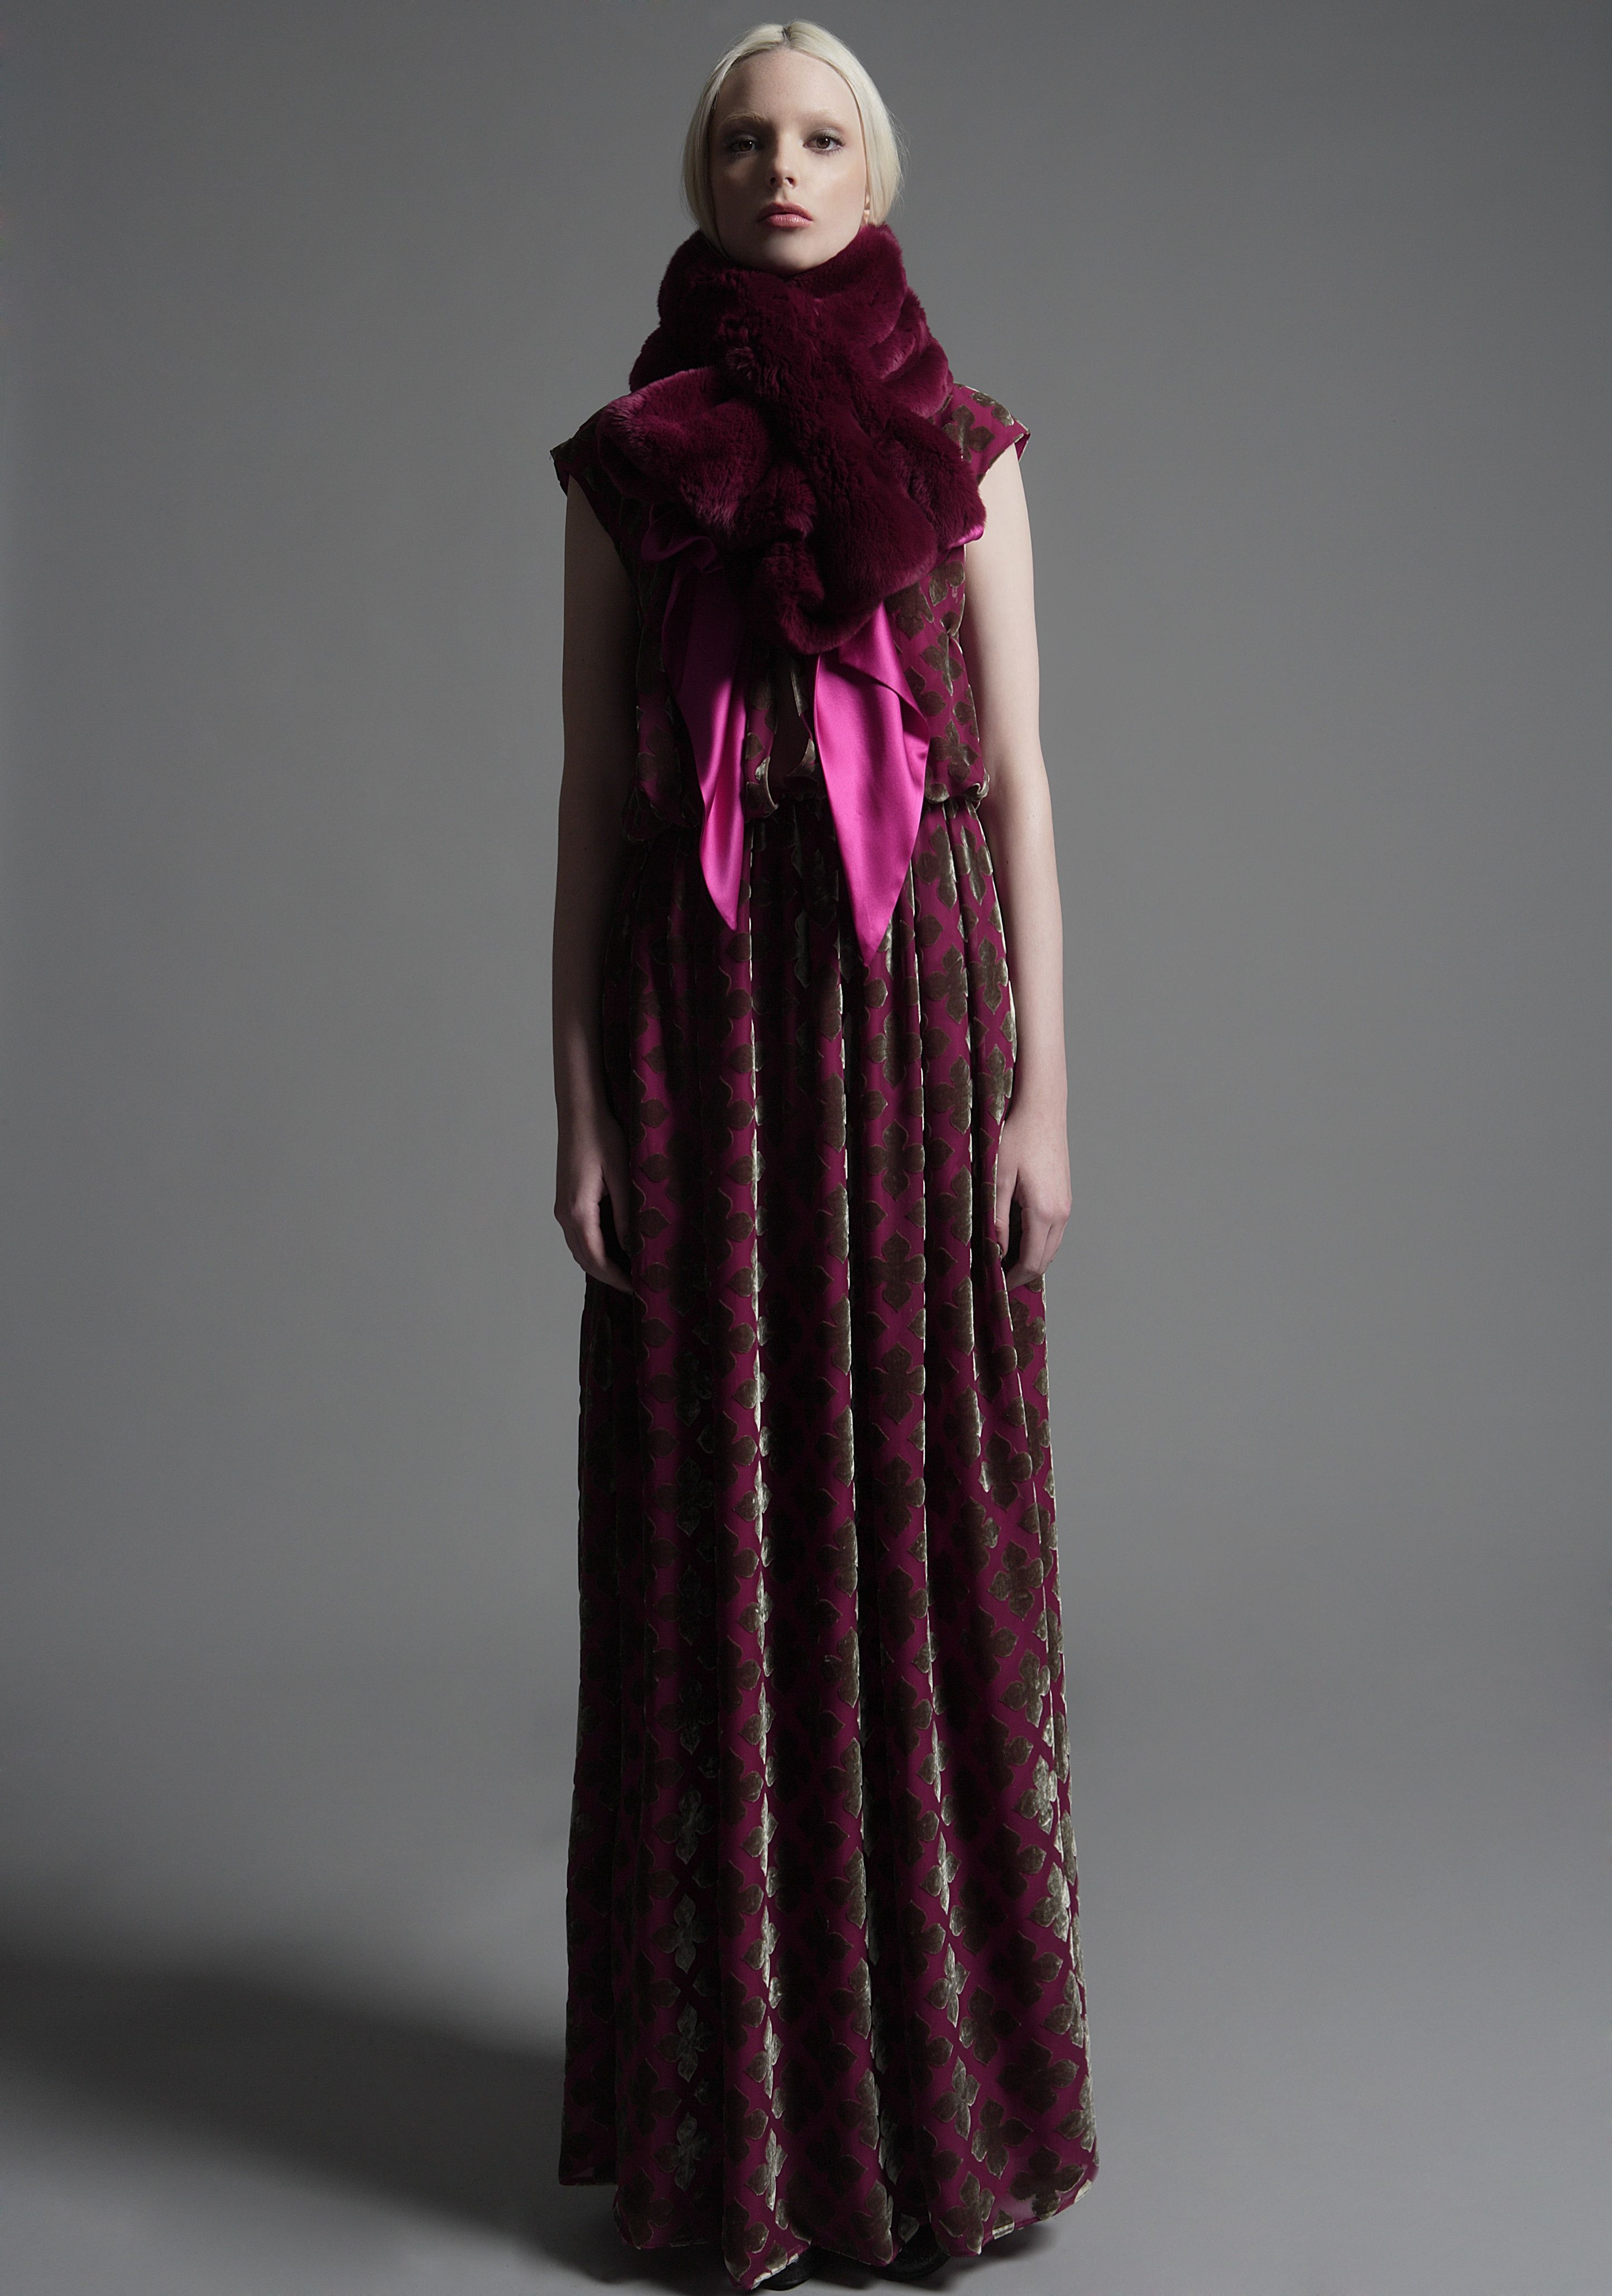 Leonora fur cross over scarf rose silk burnout velvet dress